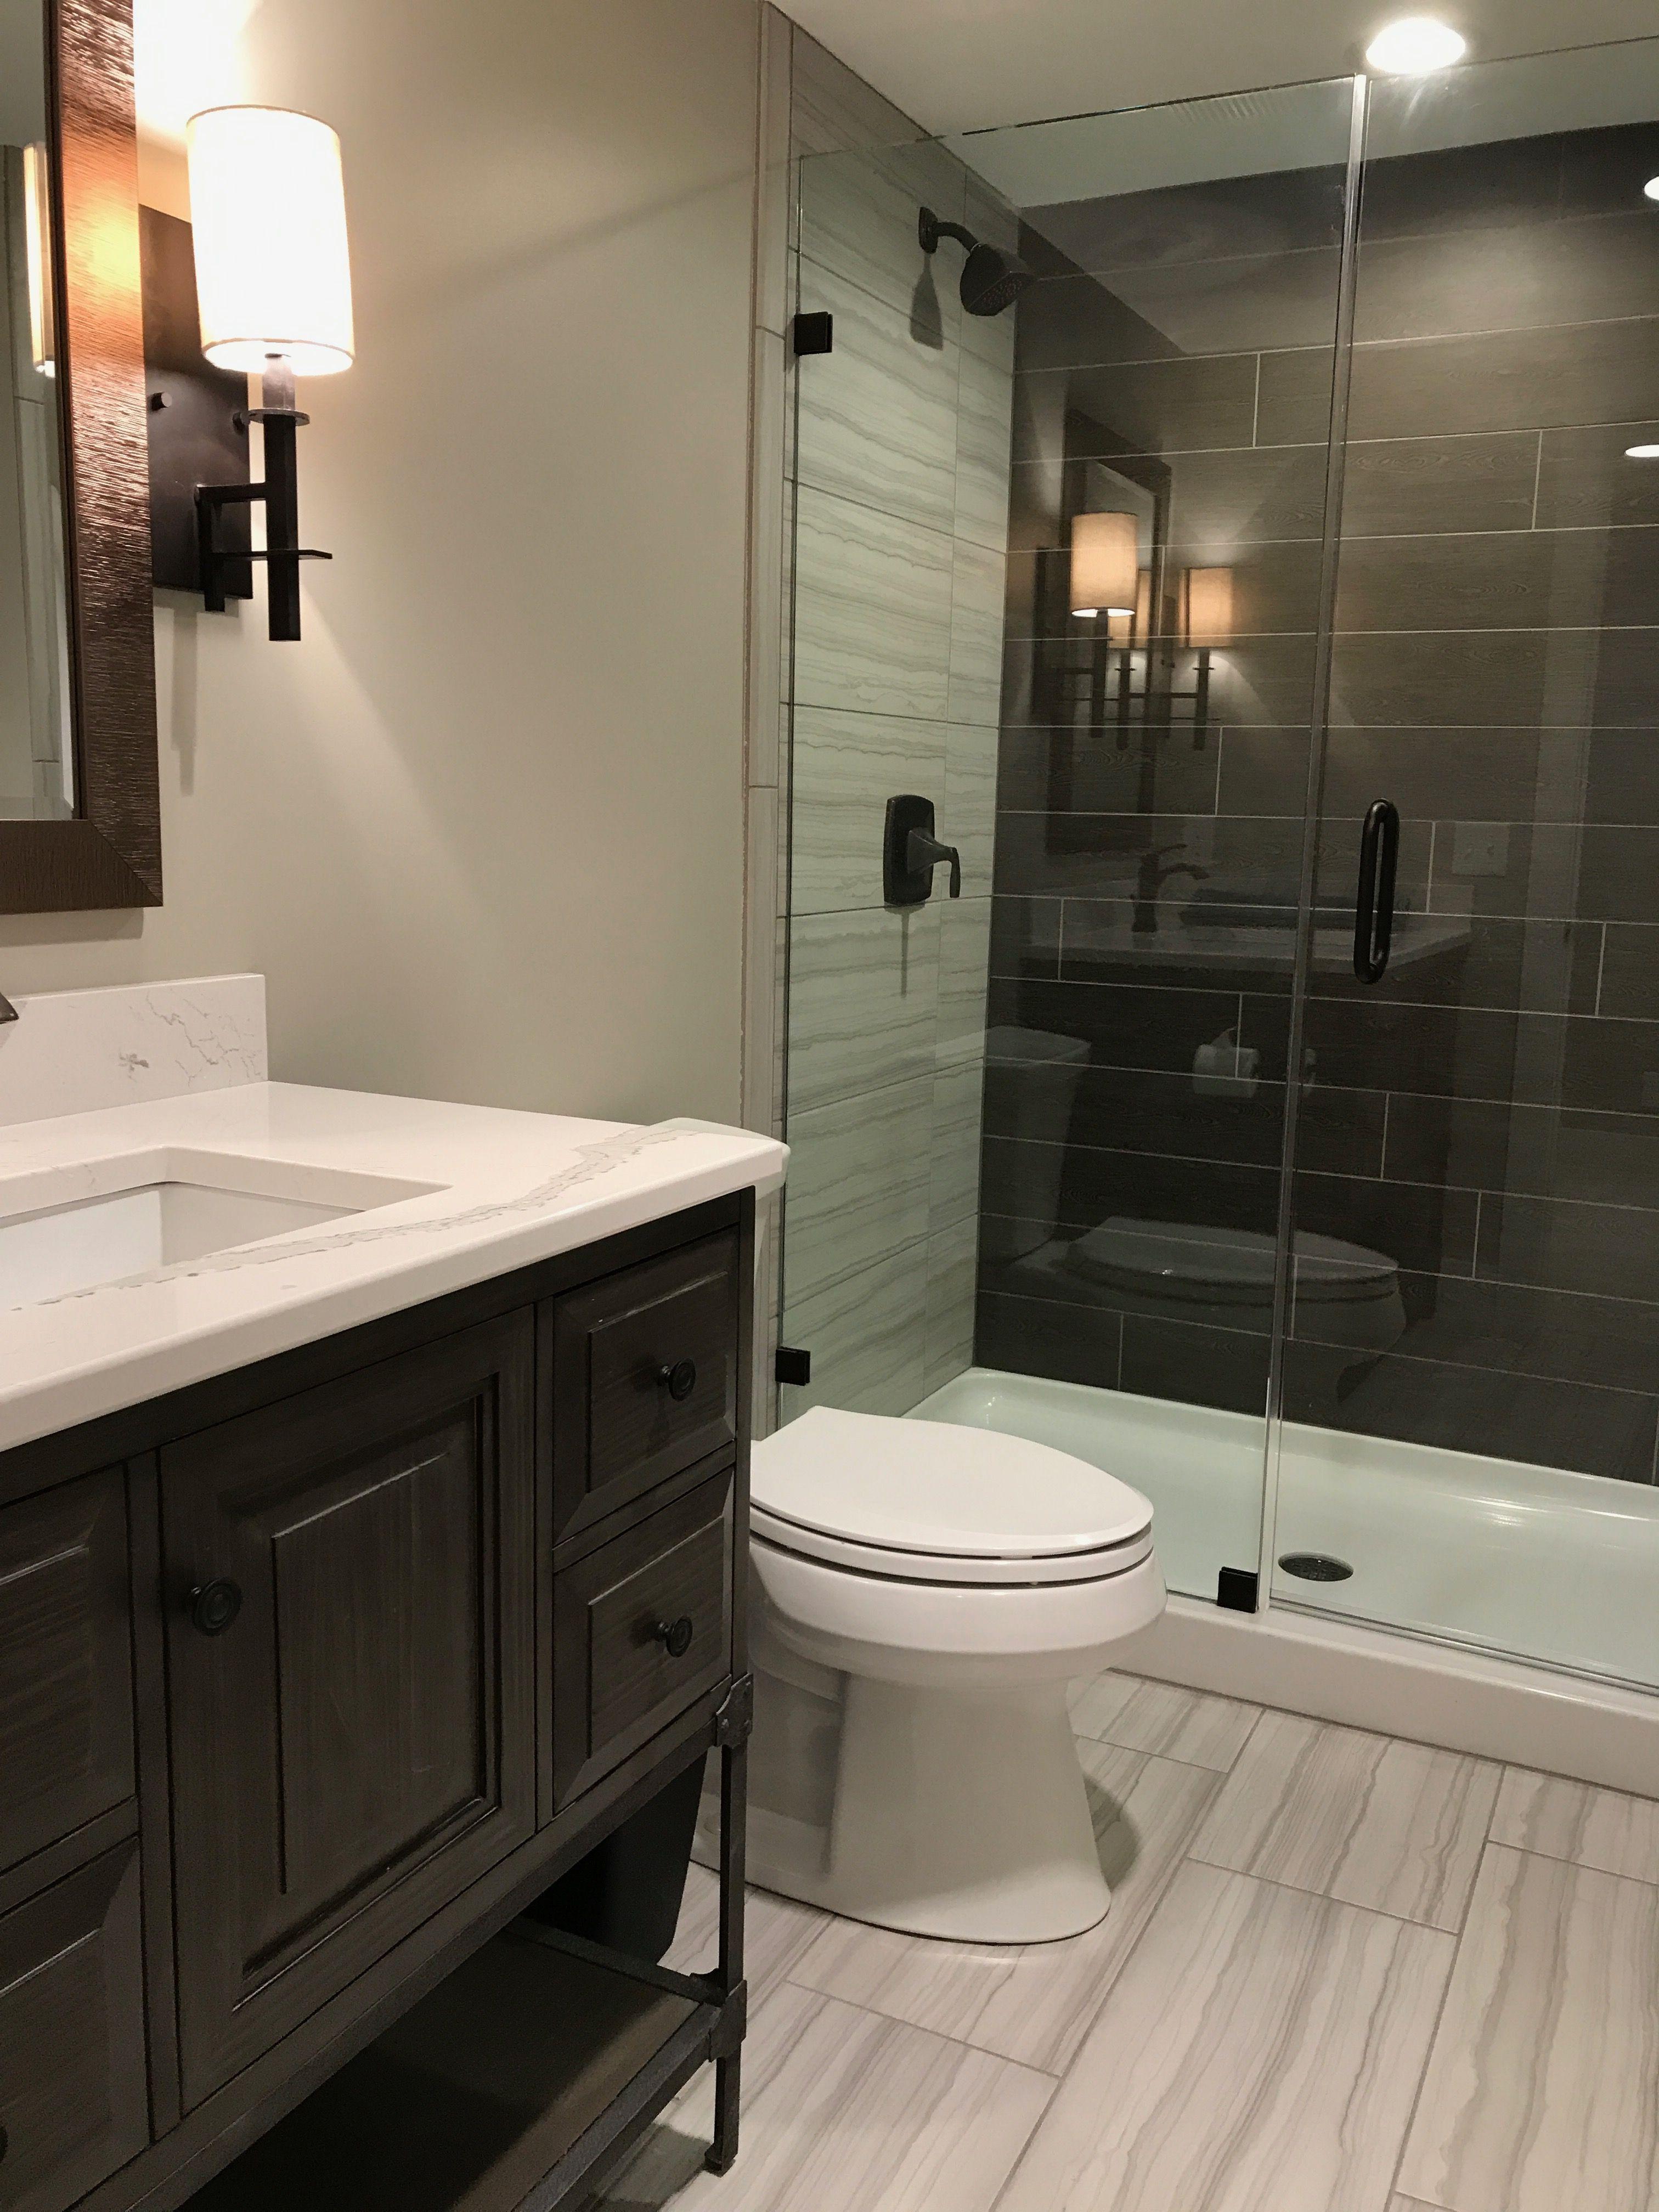 pinoldenhuis contracting inc on bathroom gallery